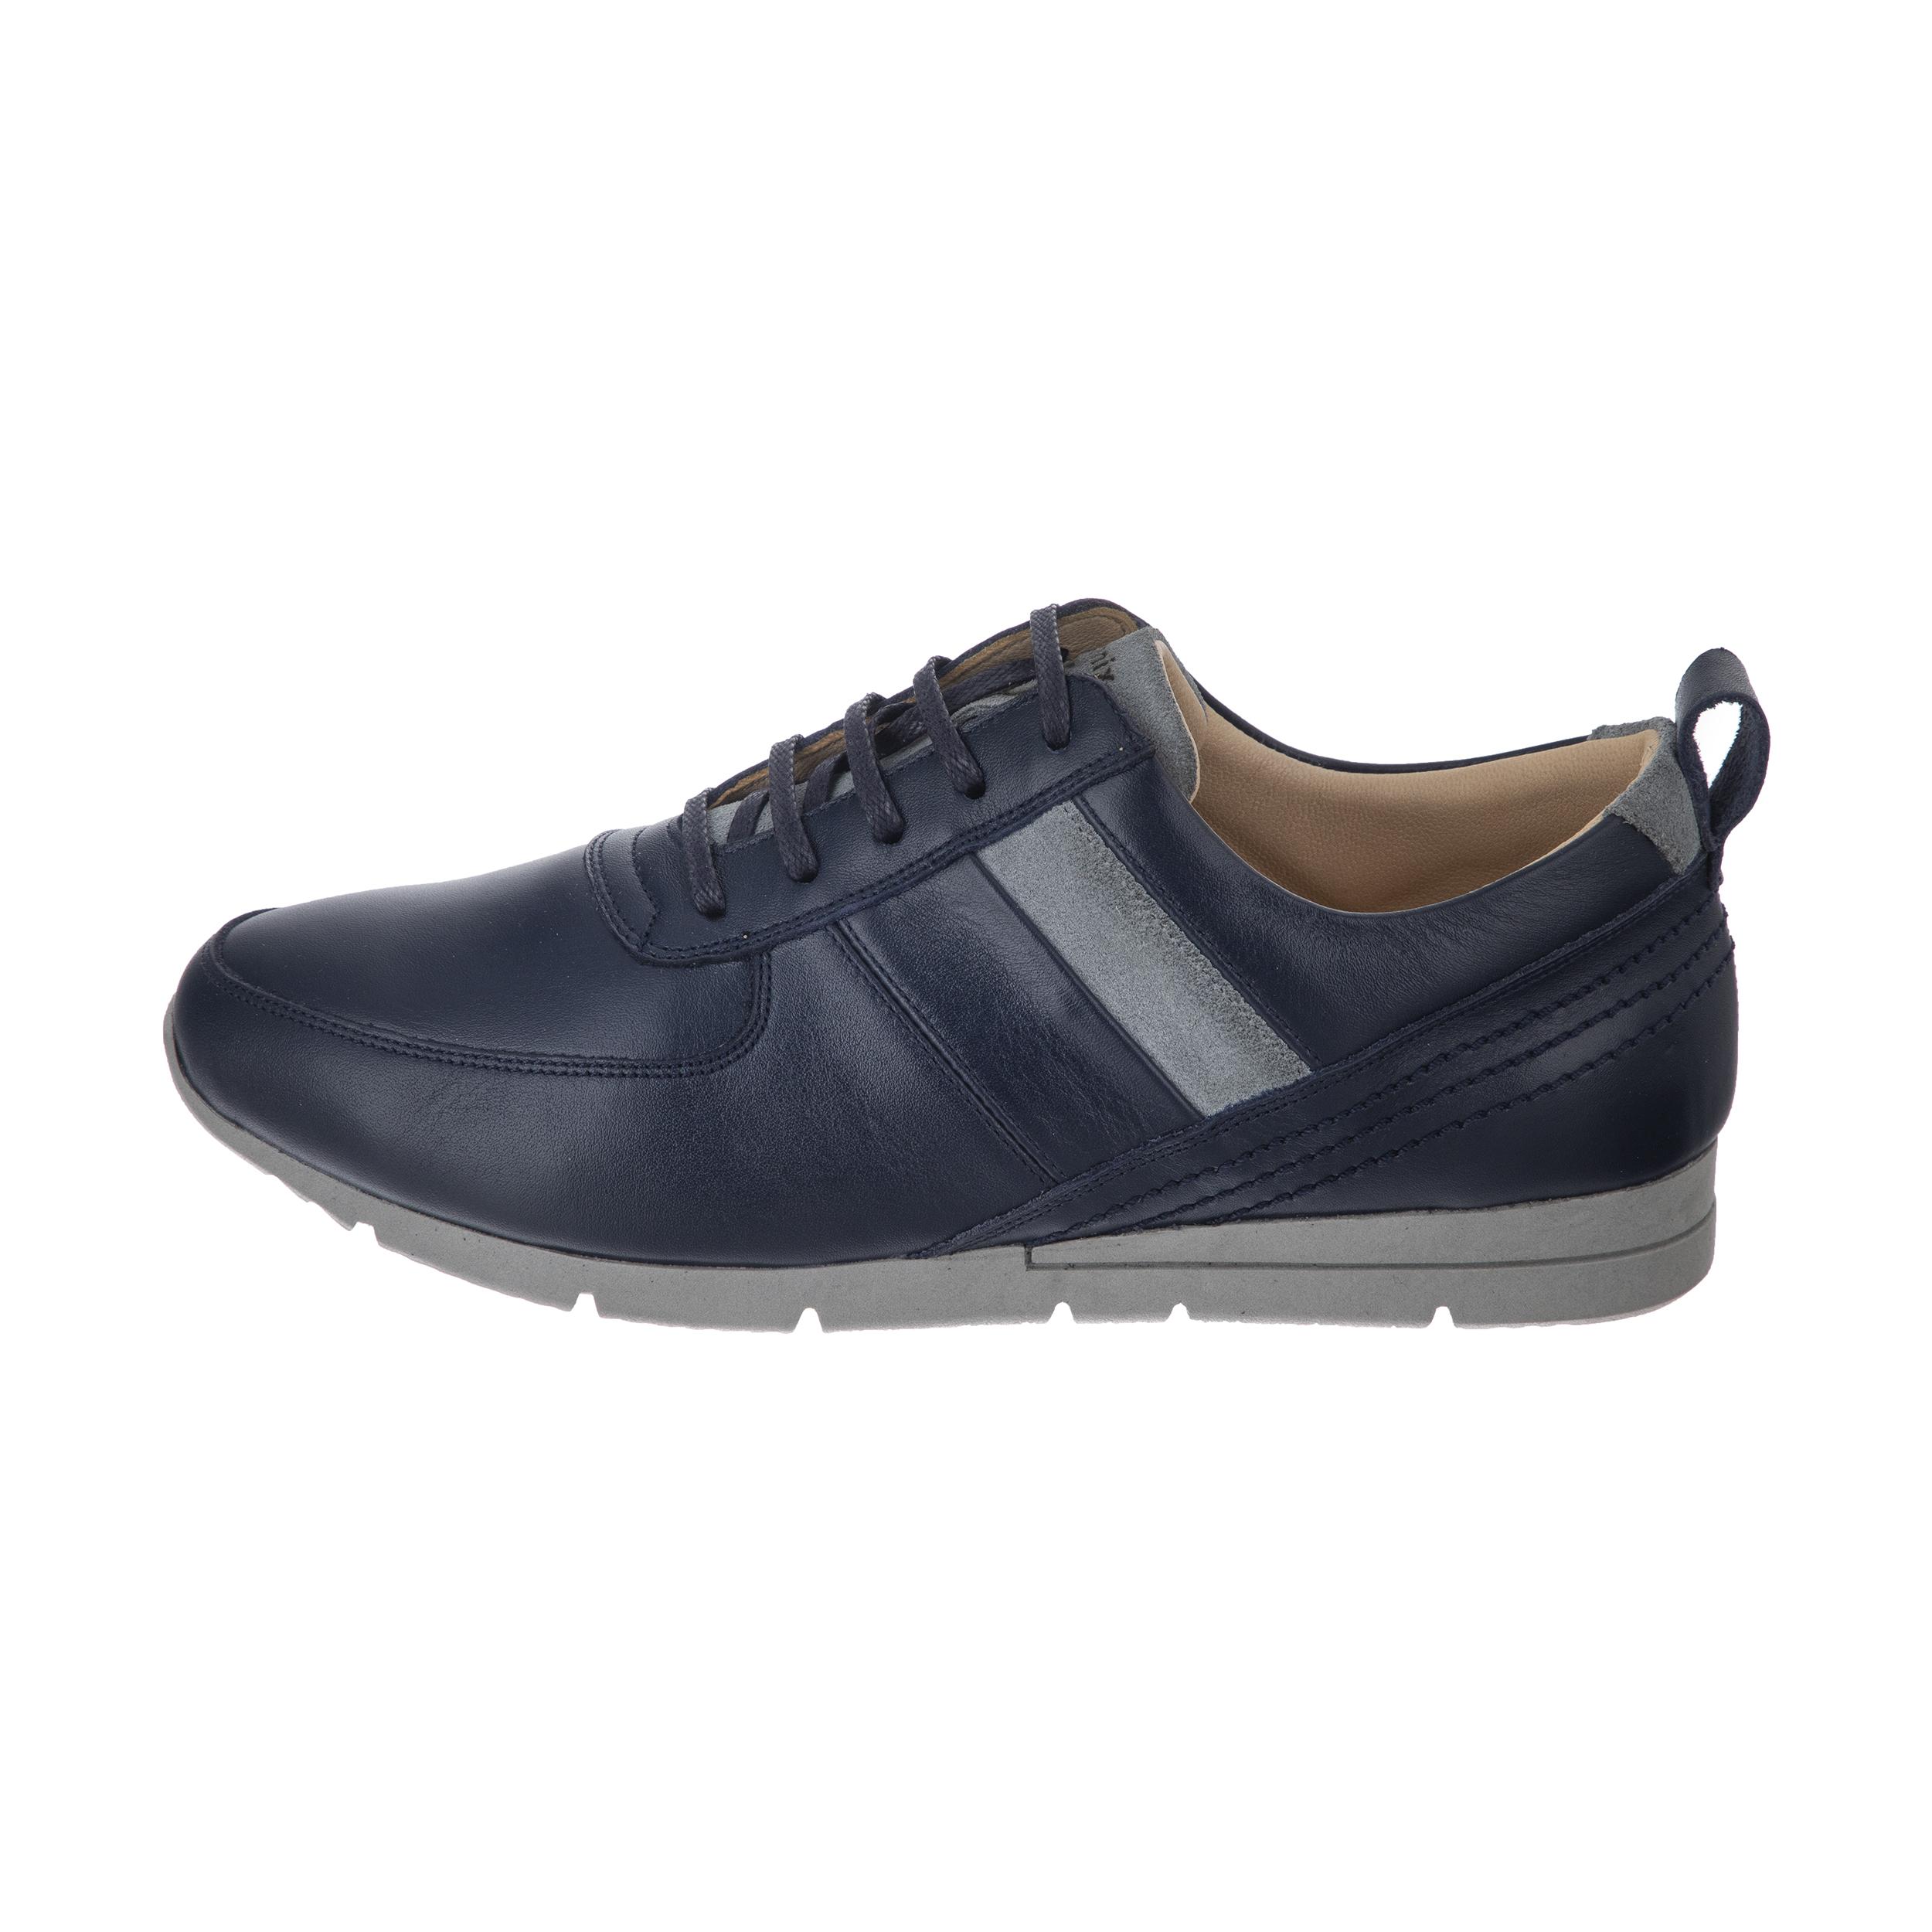 کفش روزمره زنانه برتونیکس مدل 320-016